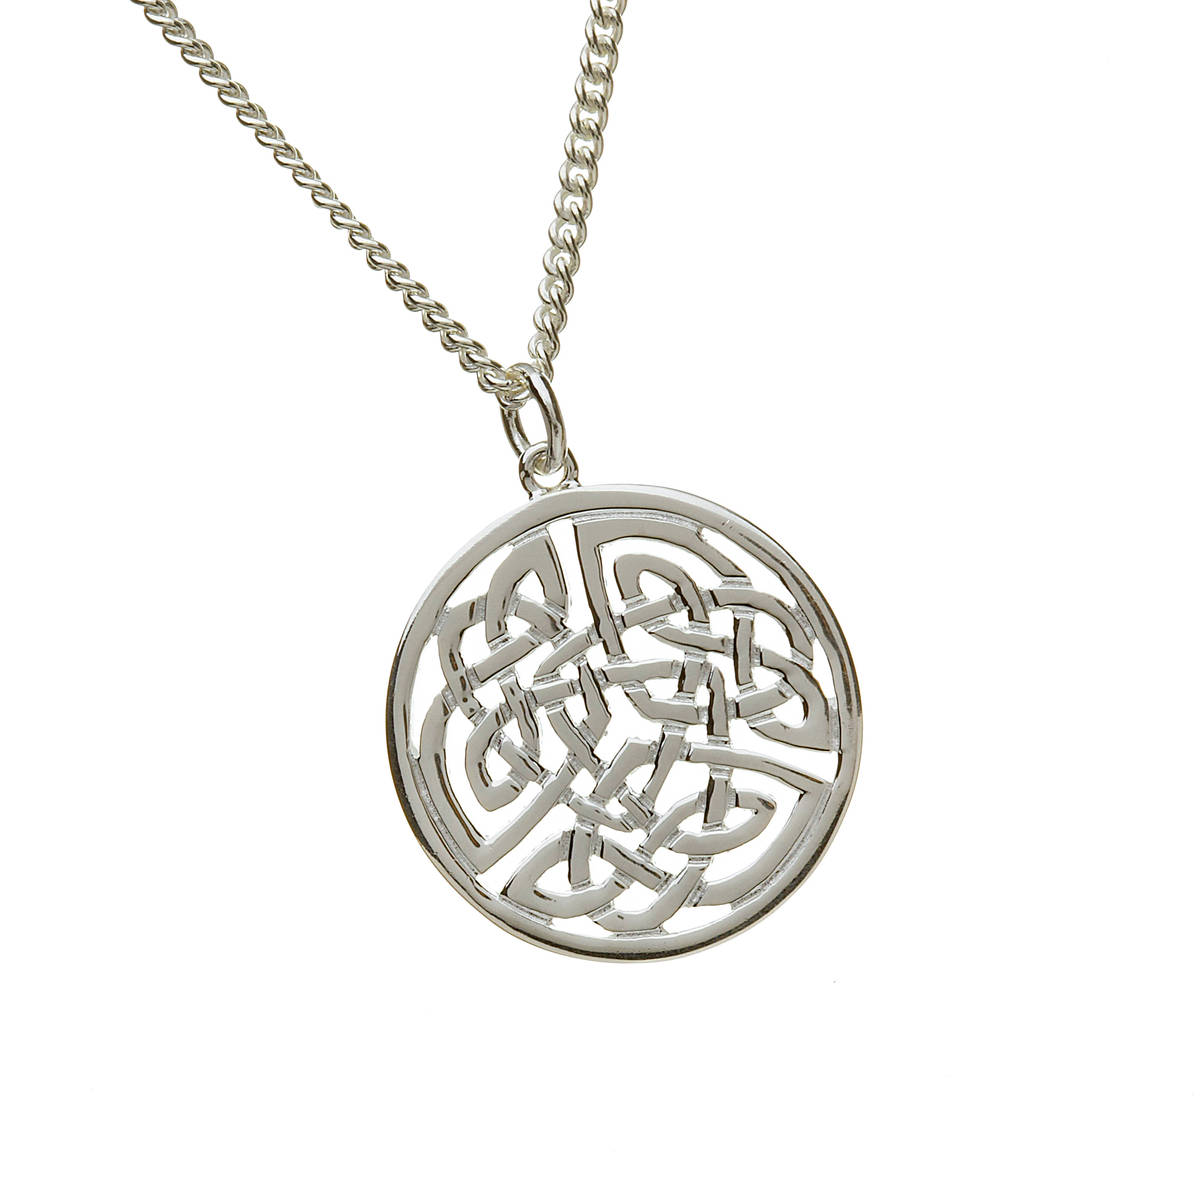 Silver Large Round Celtic Pendant